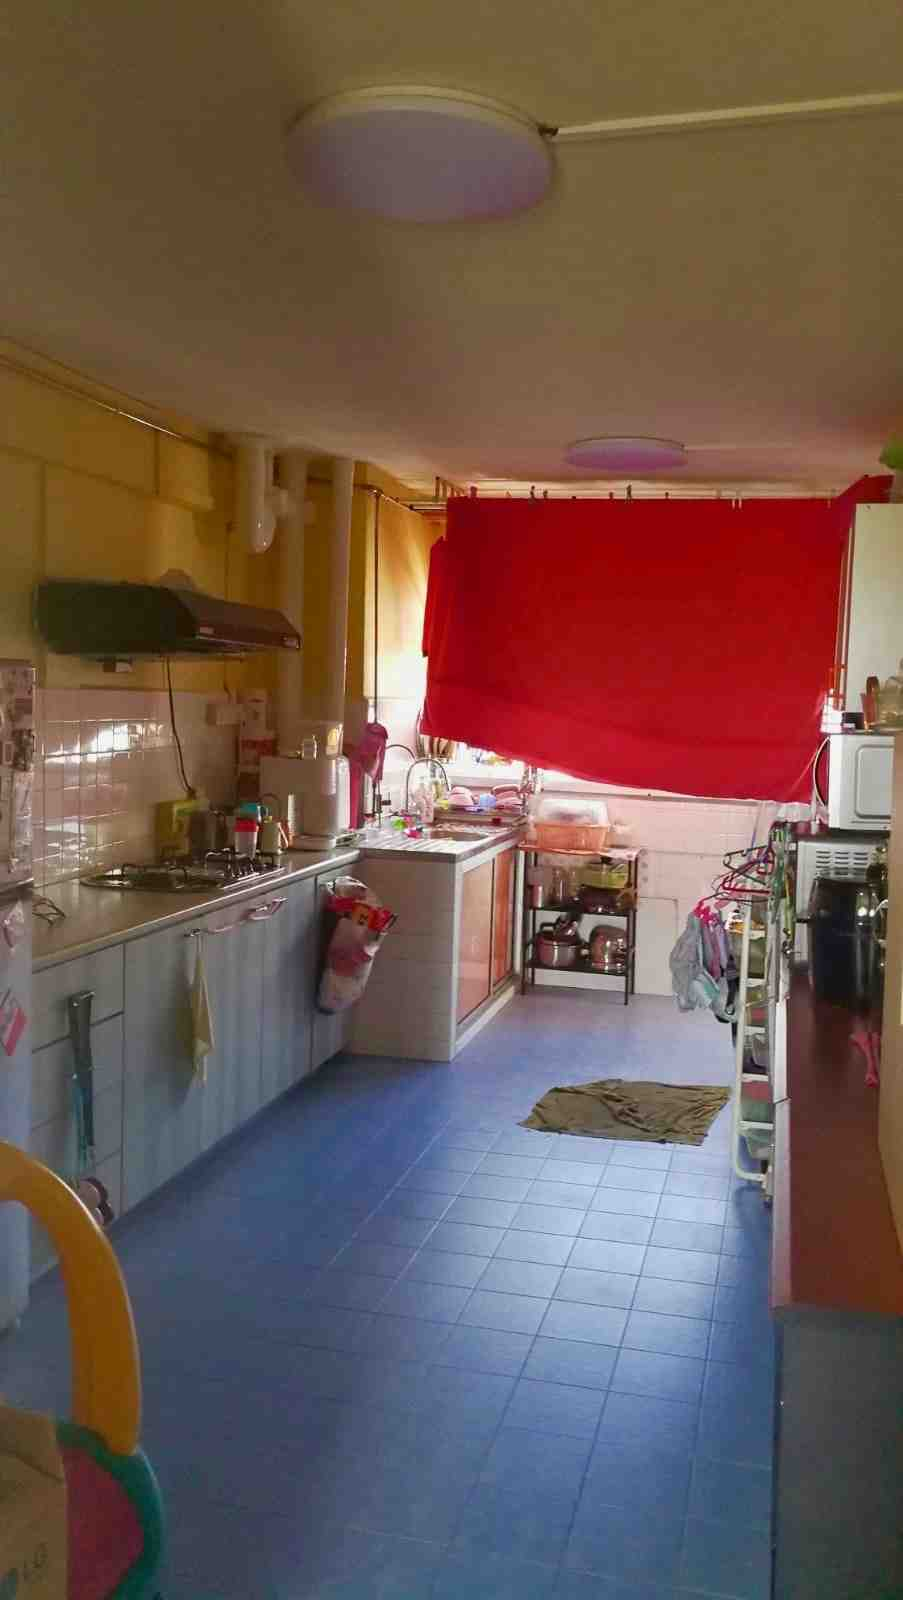 156 amk kitchen 12.40.10 pm